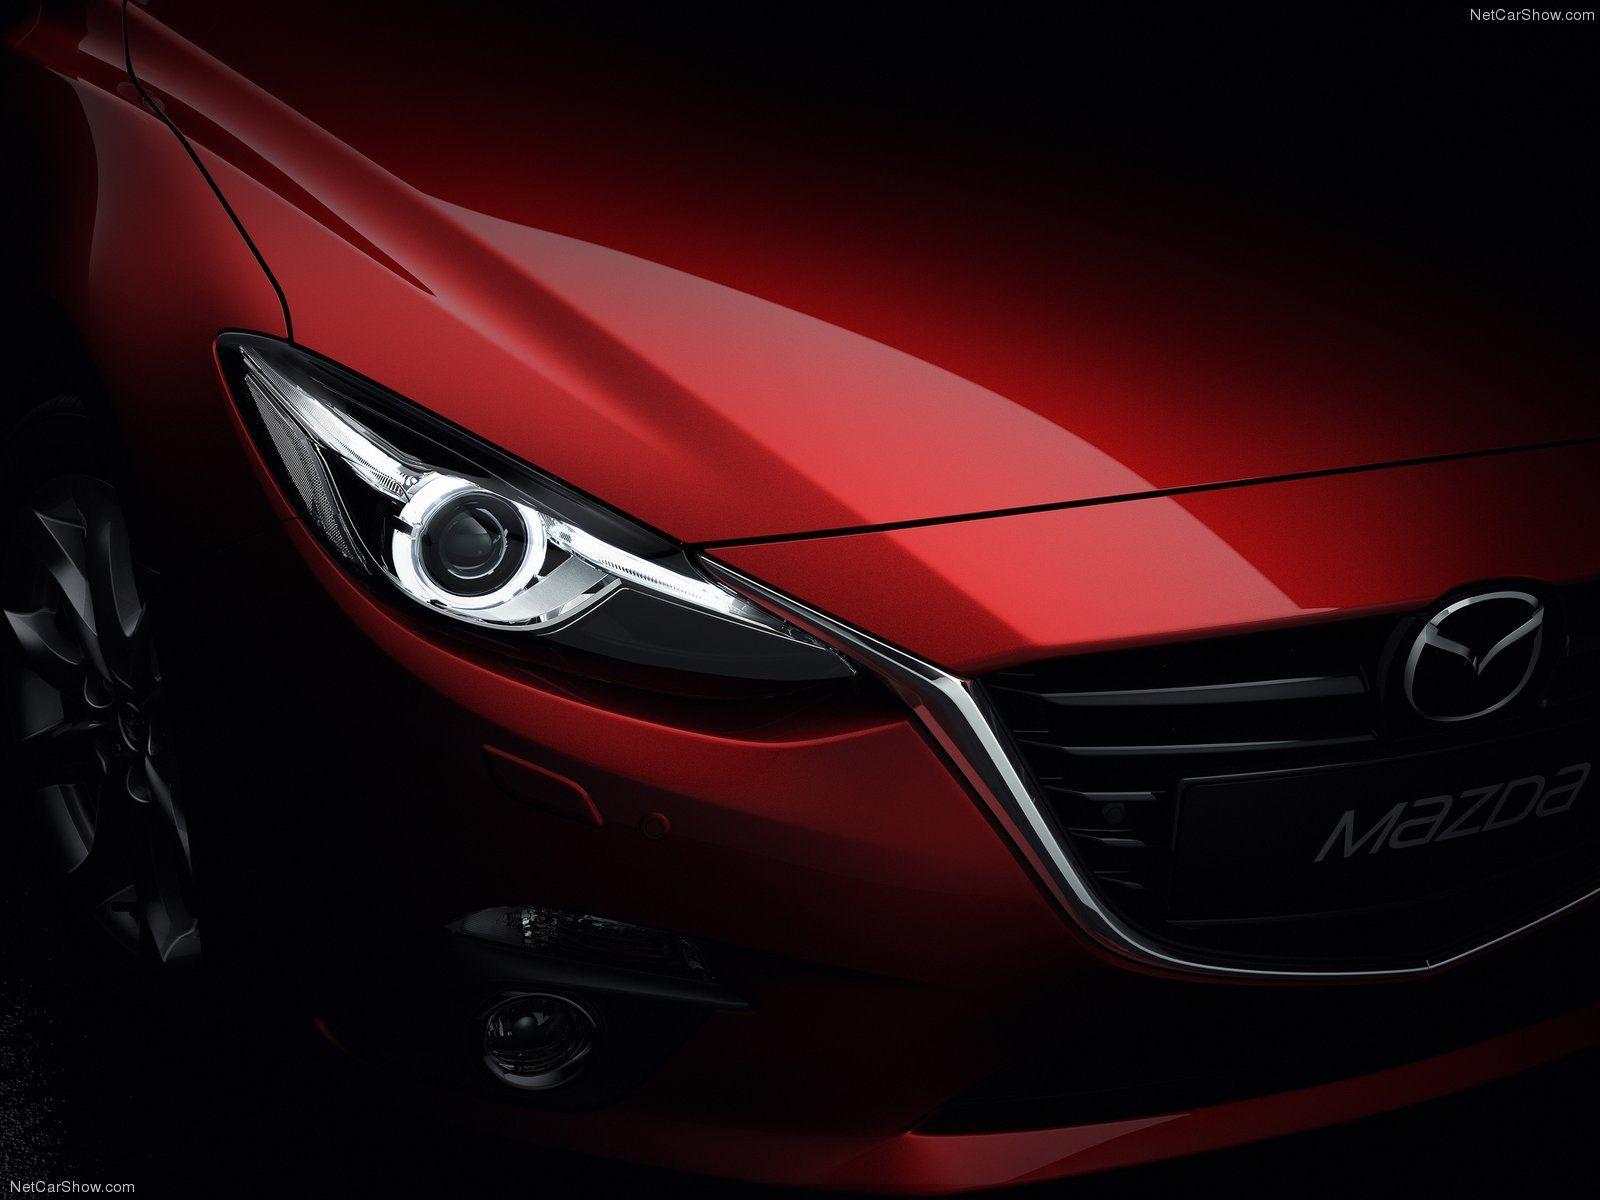 A Wonderful Car That Runs Great Mazda Hatchback Cars